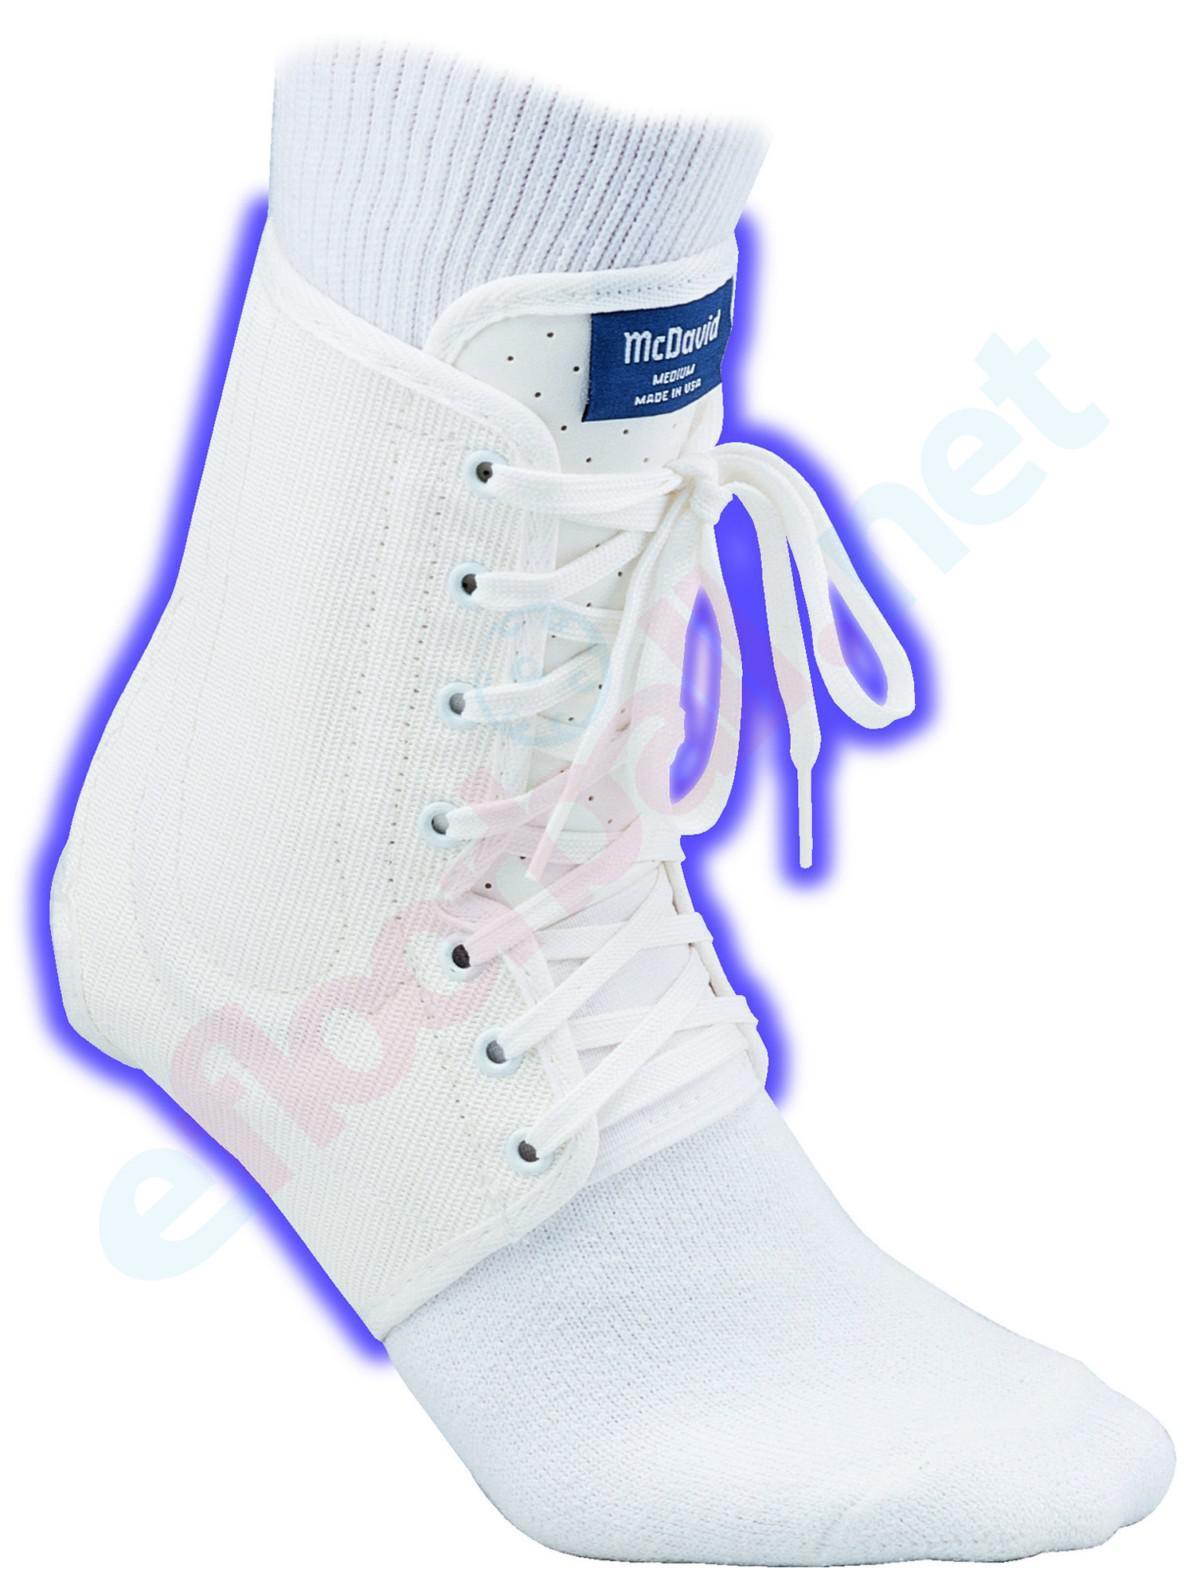 Ankle brace for McDavid Soccer Ankle Brace 196R ...